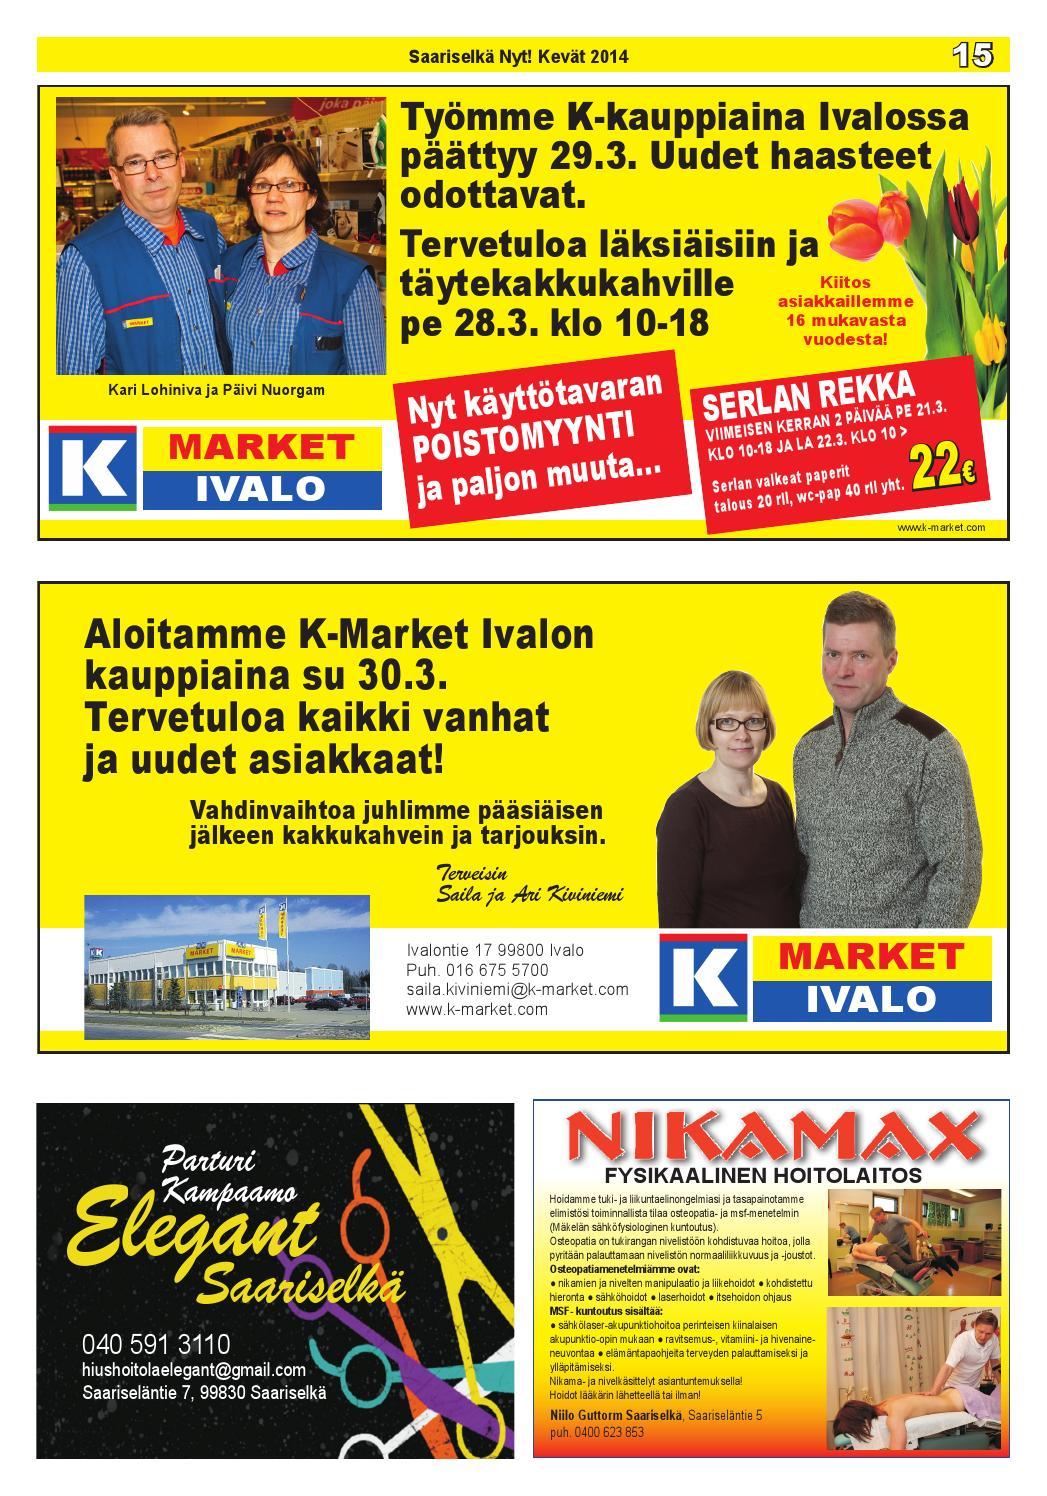 K Market Kiviniemi